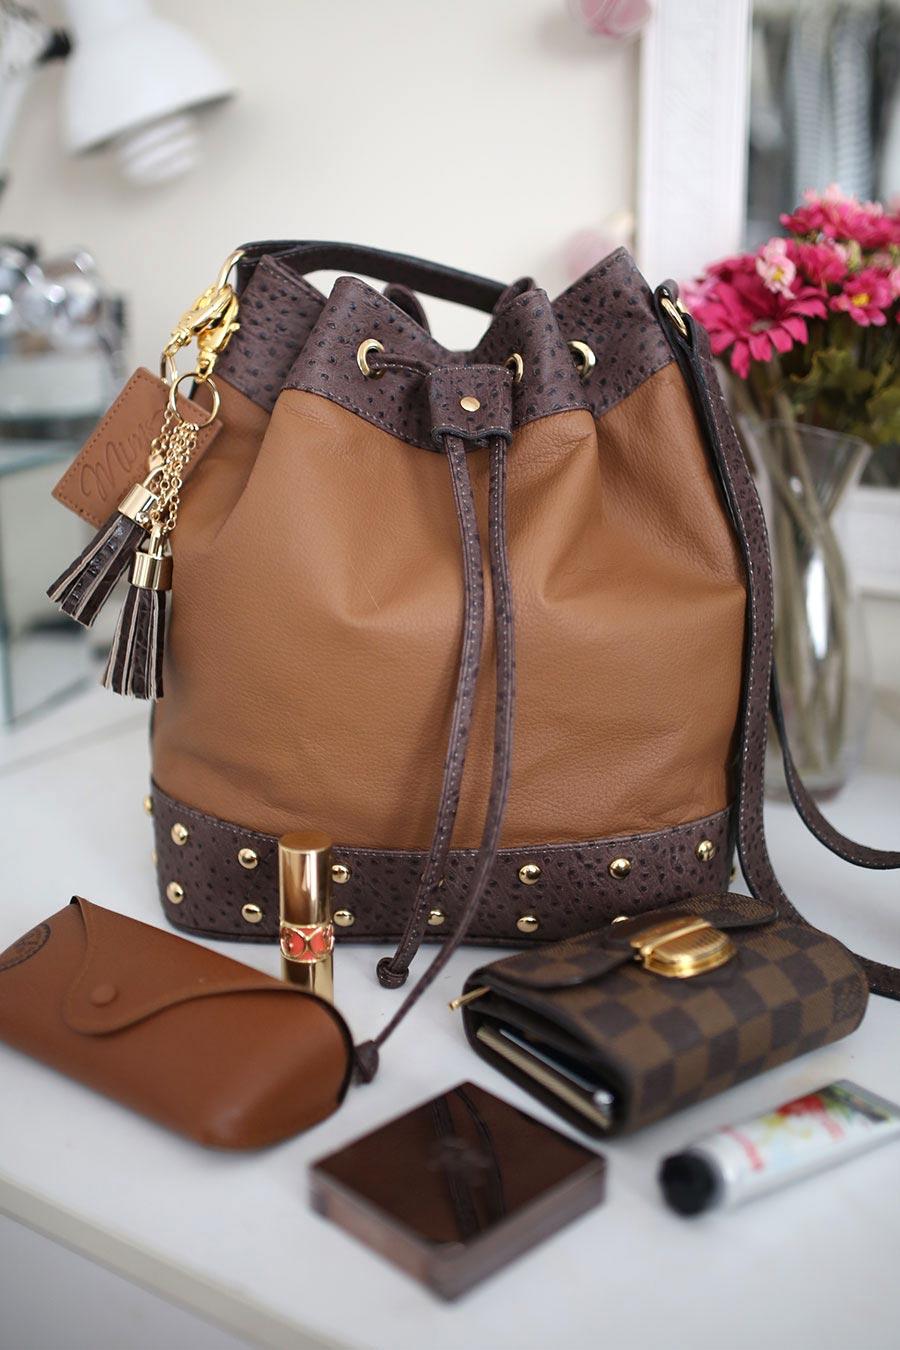 bolsa-customizada-mims-003